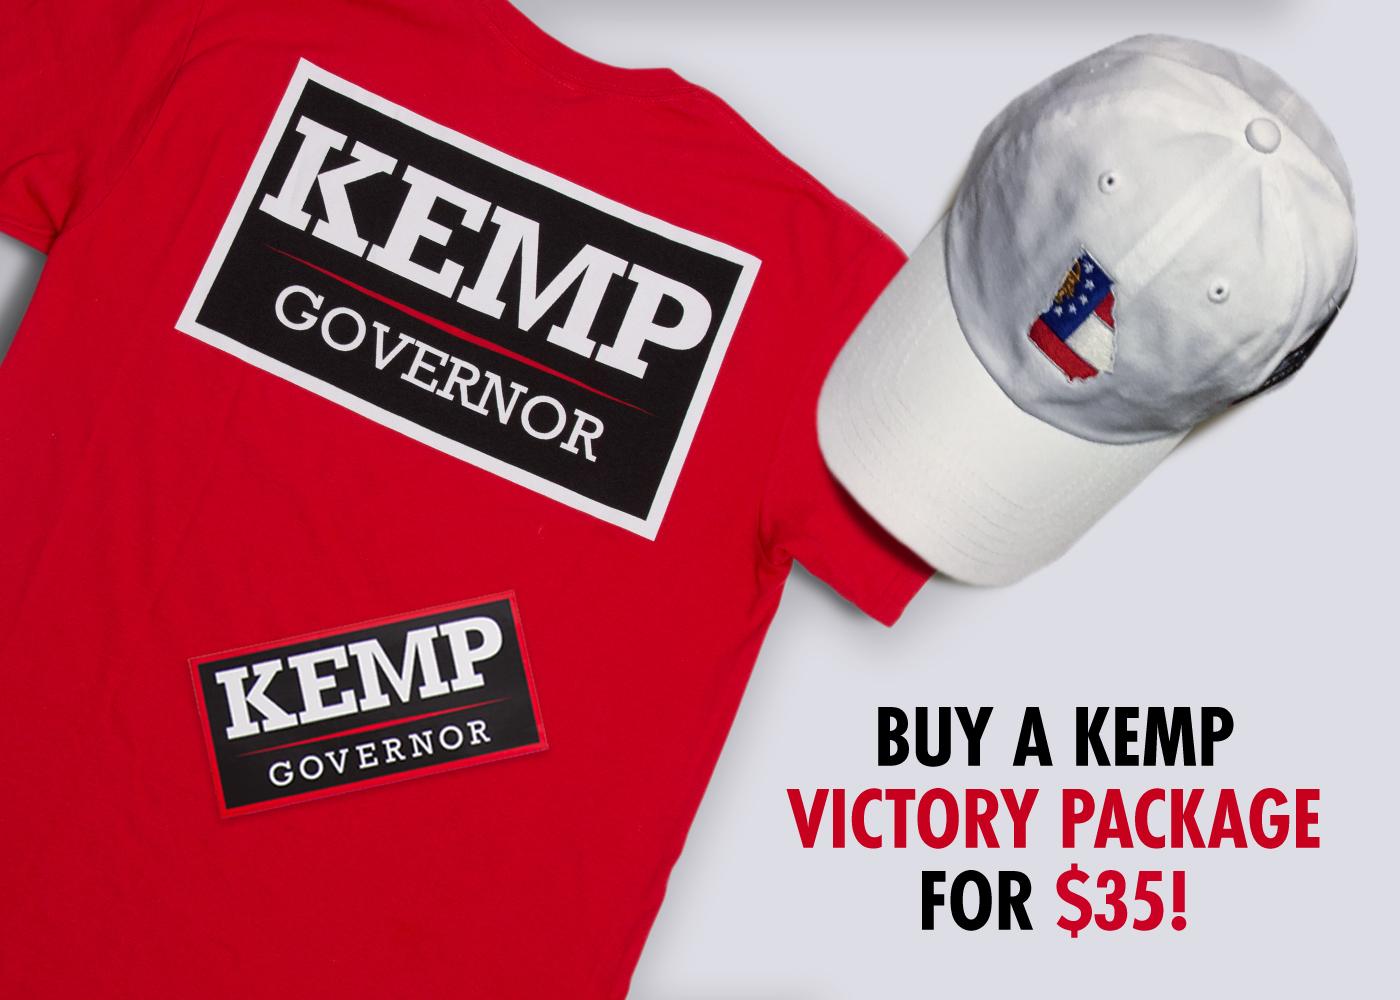 Kemp_GA_Anedot_Merchandise_Background_1400x1000.jpg